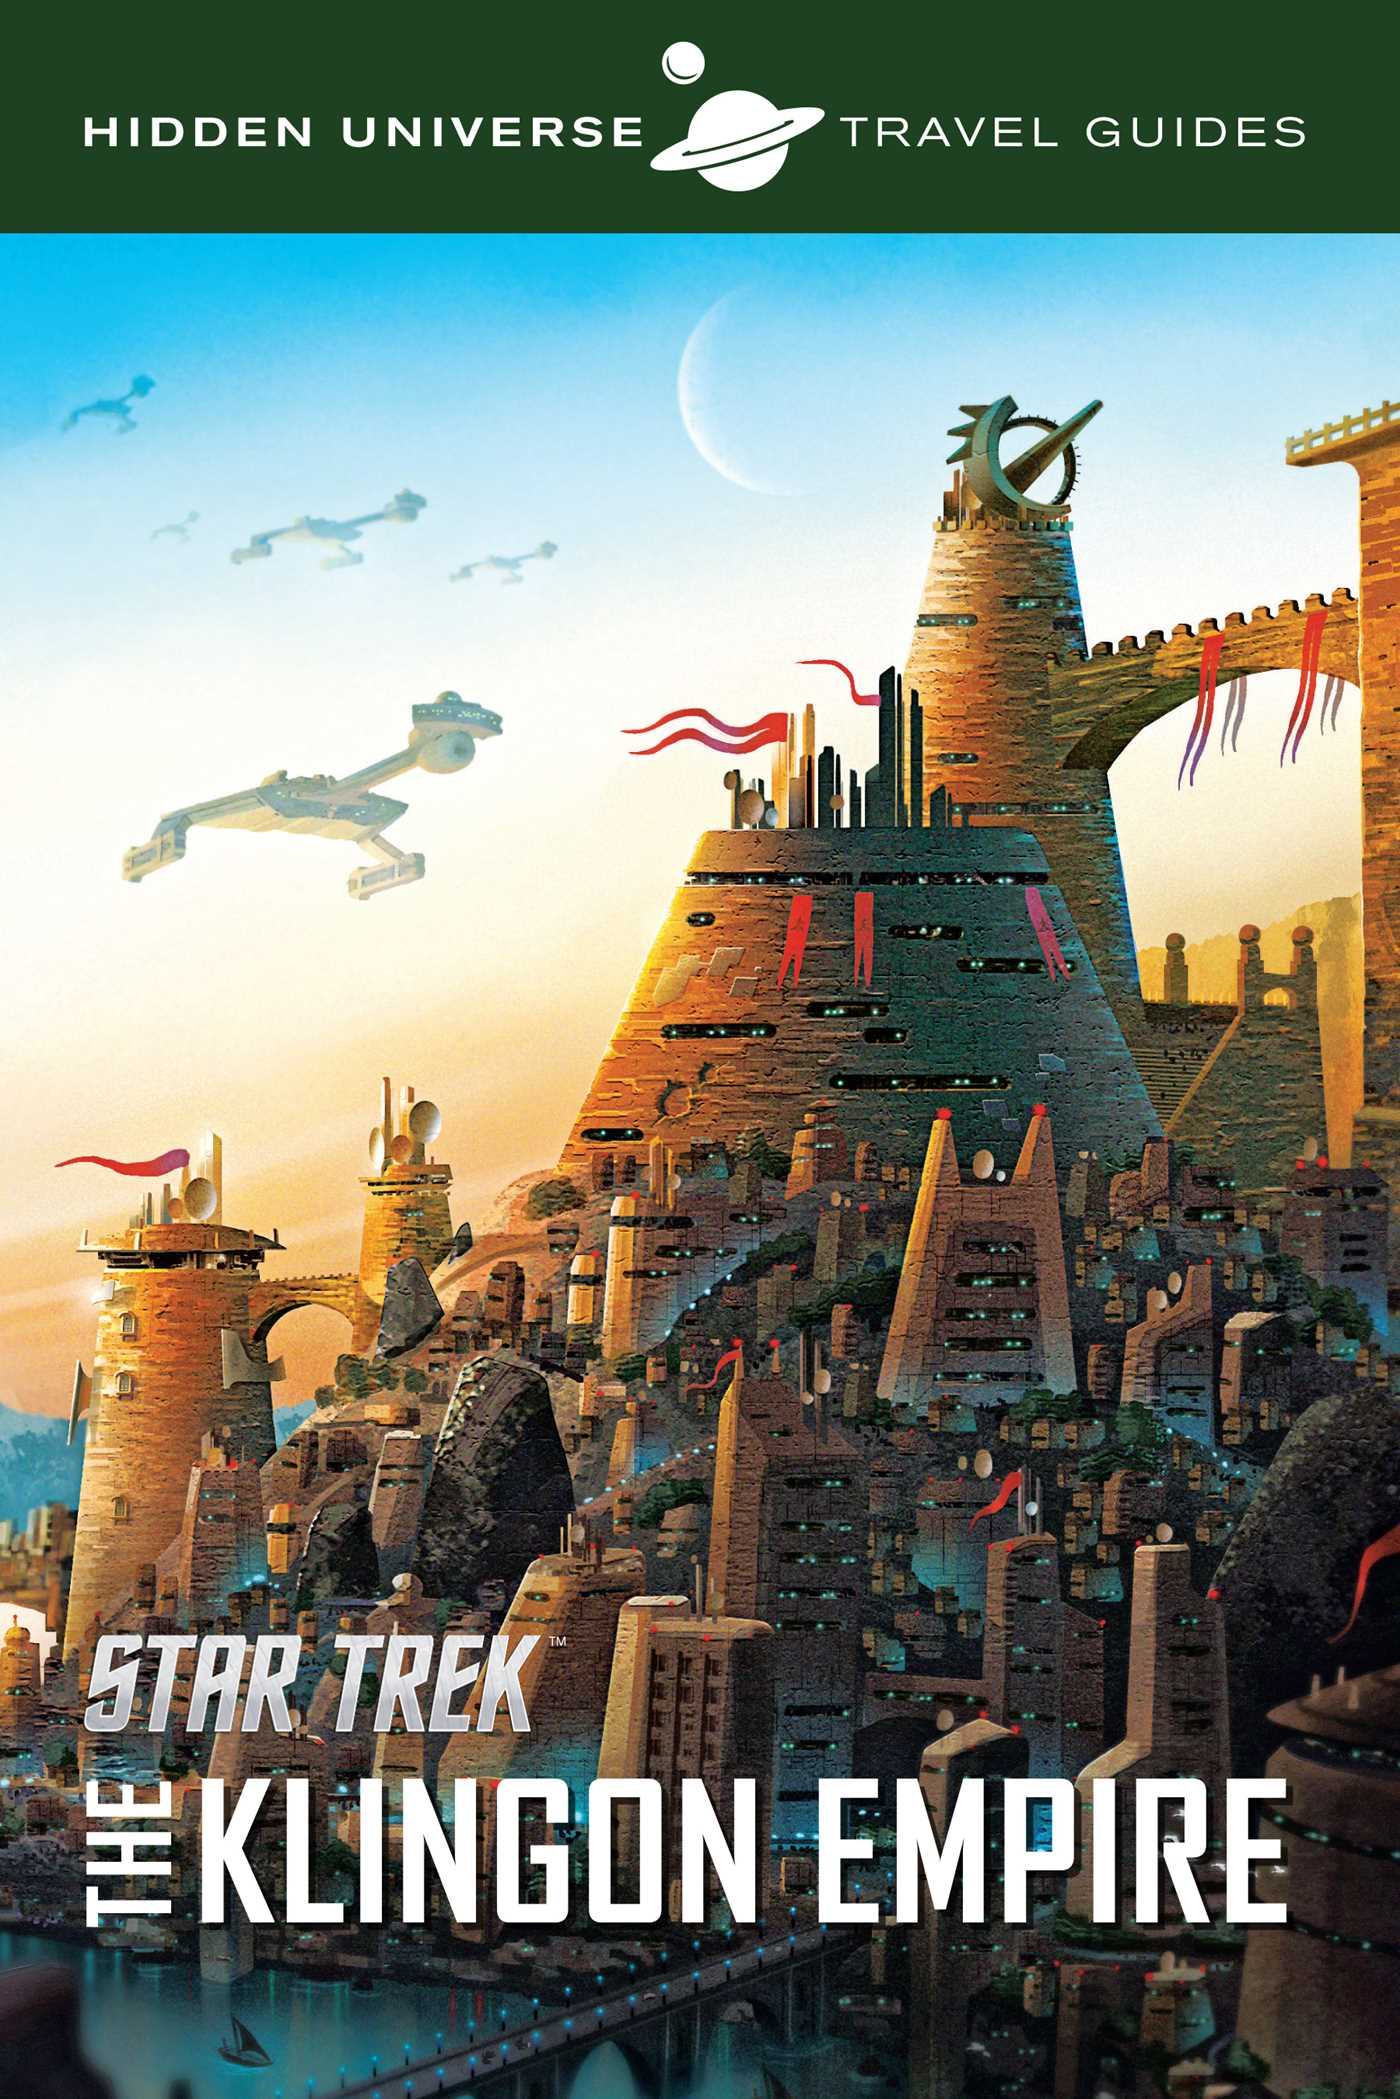 Hidden universe travel guides star trek 9781608875191 hr